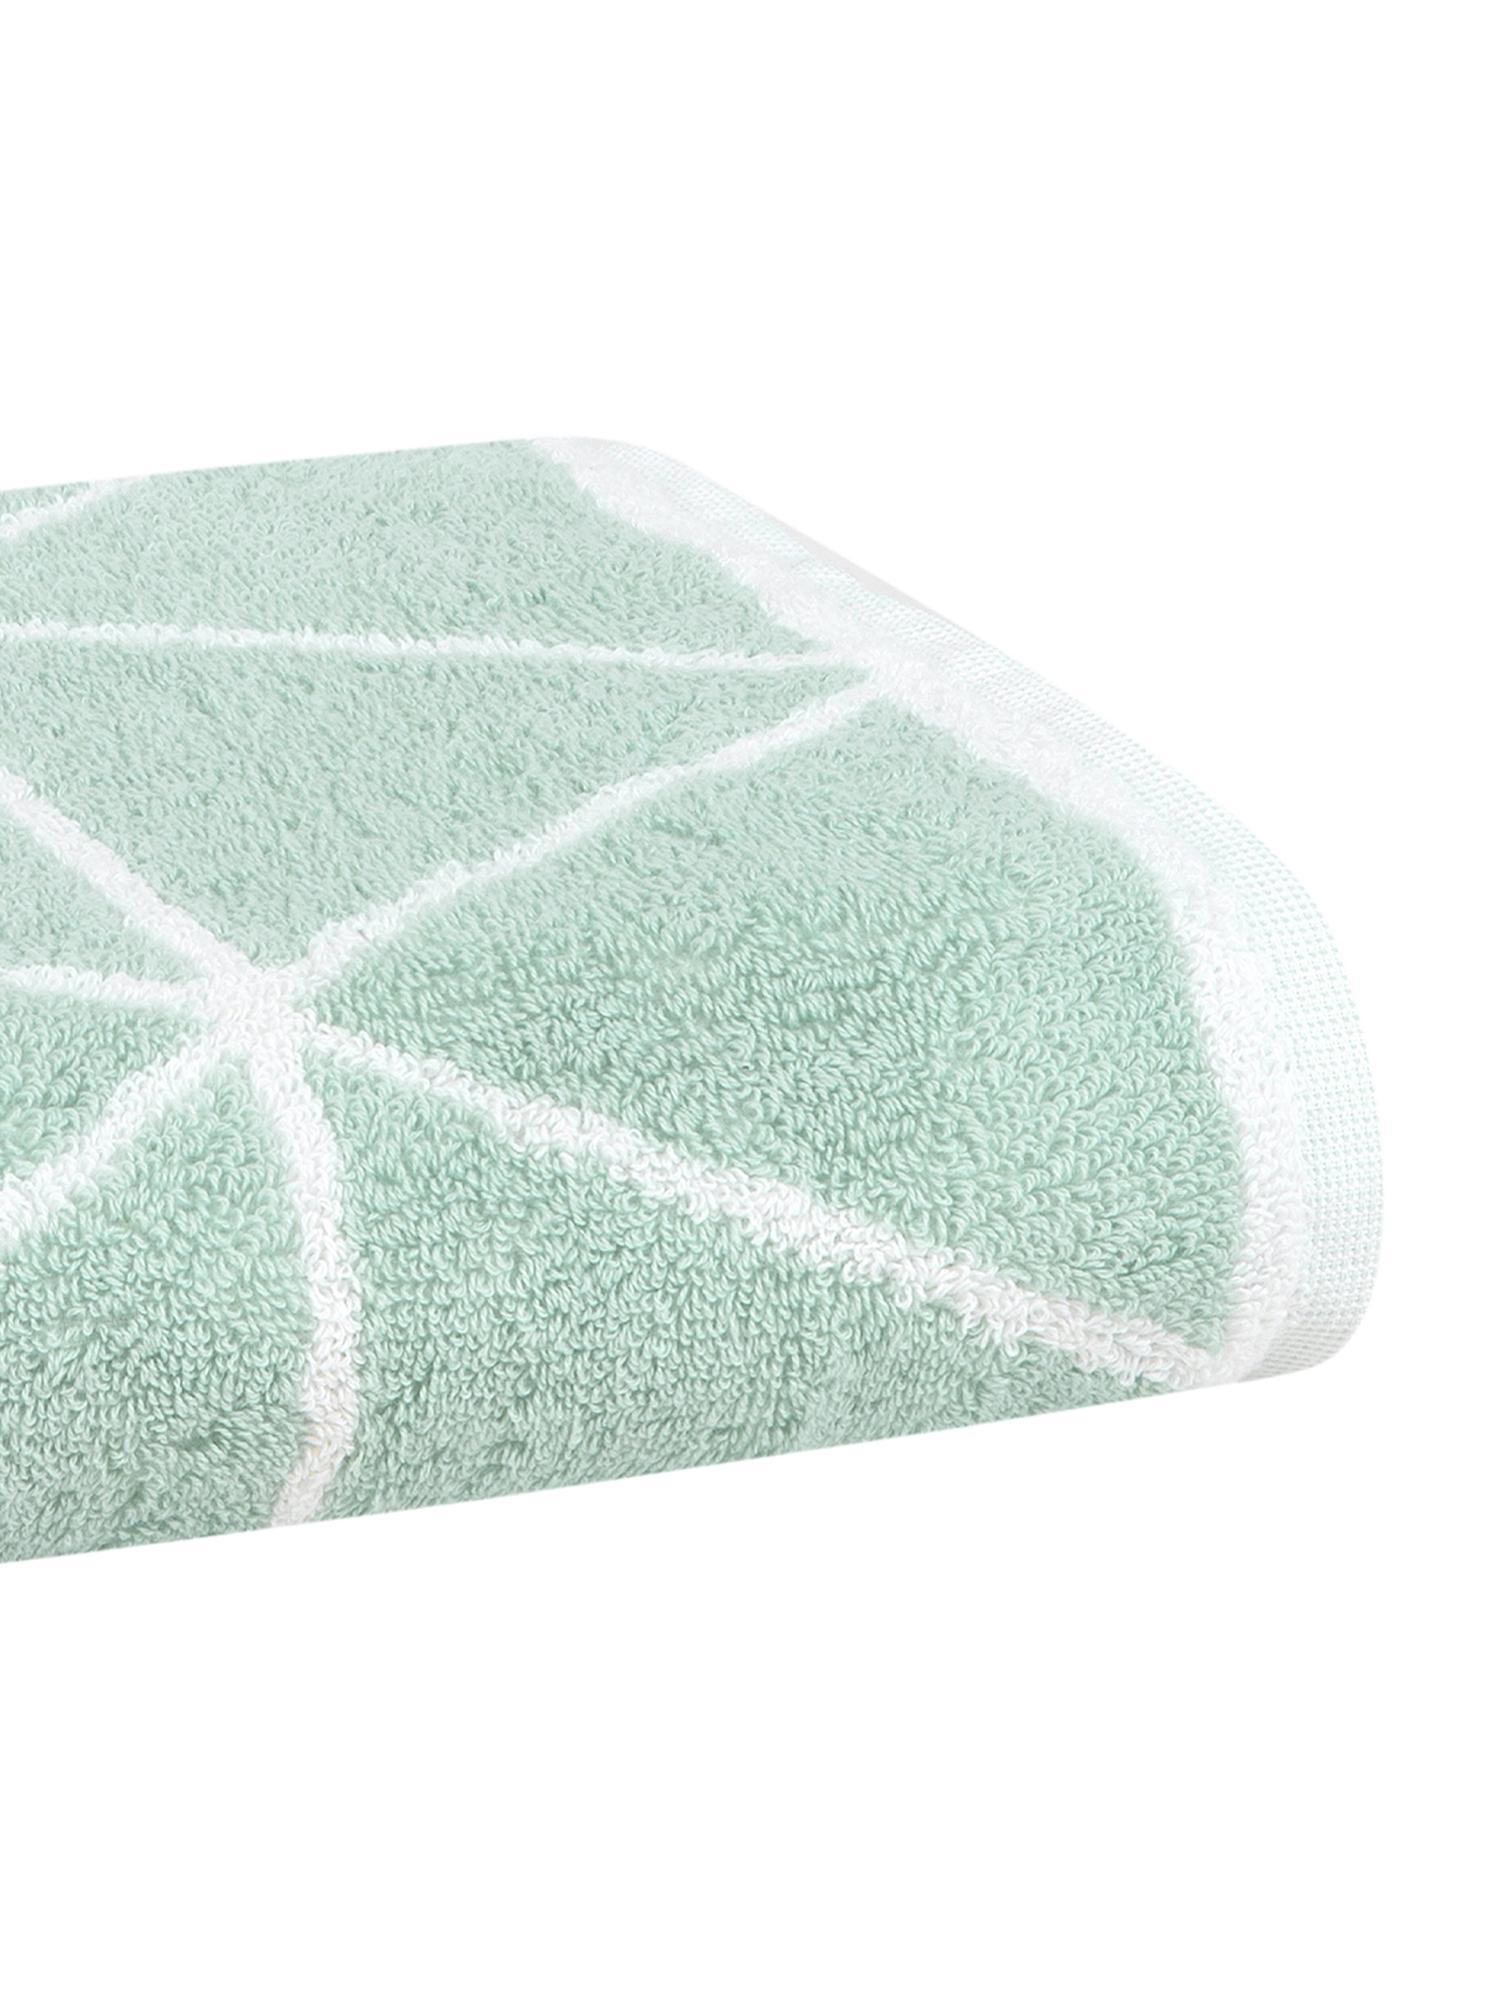 Set 3 asciugamani reversibili Elina, Verde menta, bianco crema, Diverse dimensioni